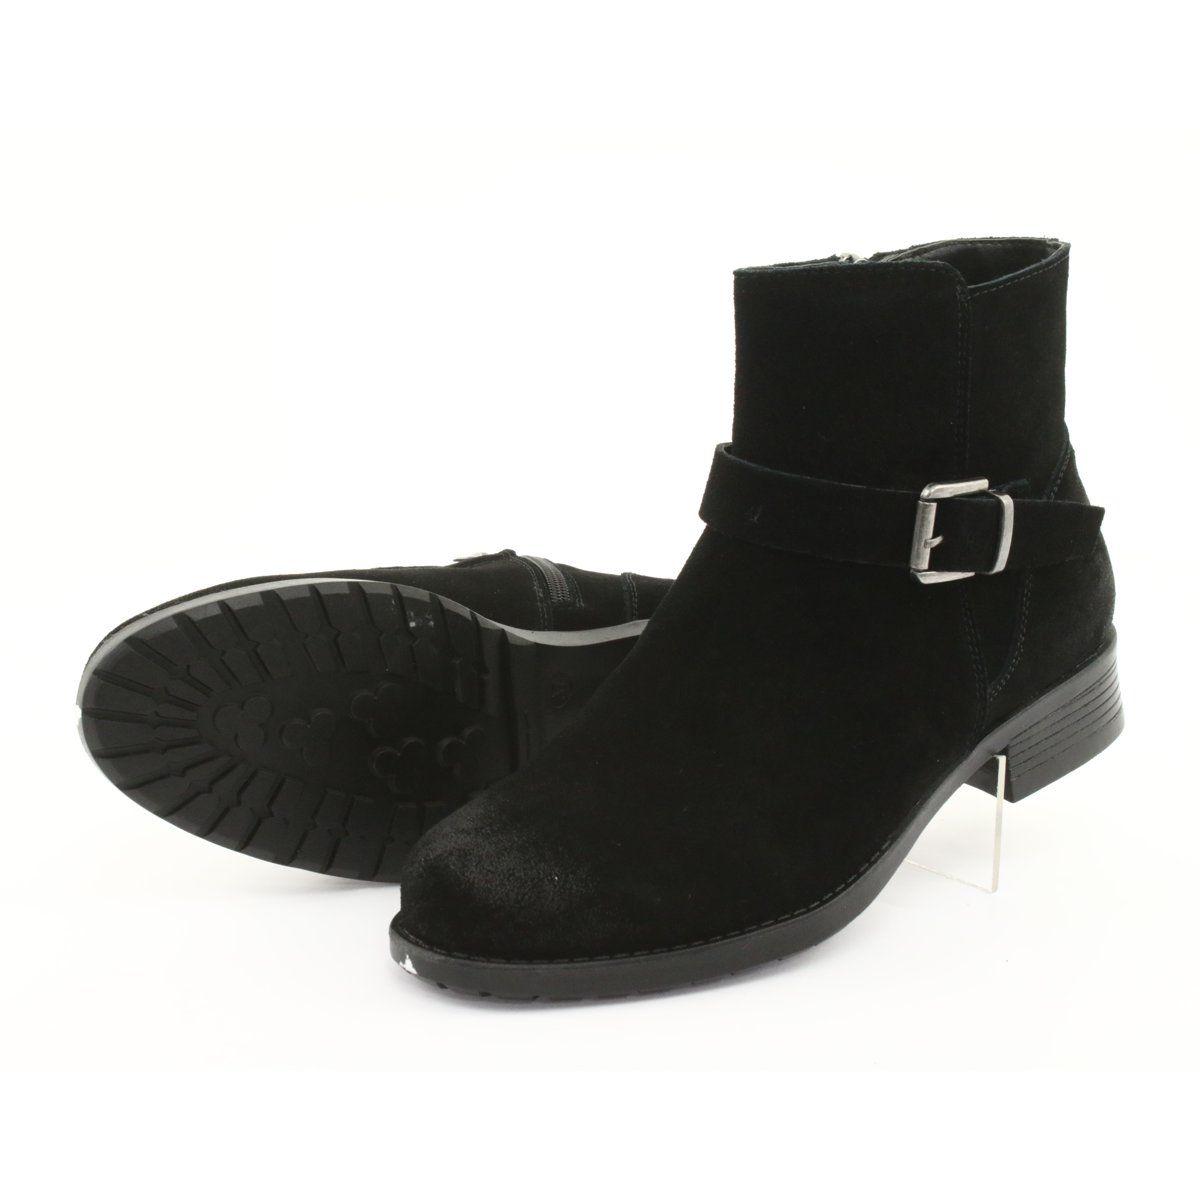 Botki Zamszowe Czarne American Club Sh04 Boots Black Boots Womens Boots